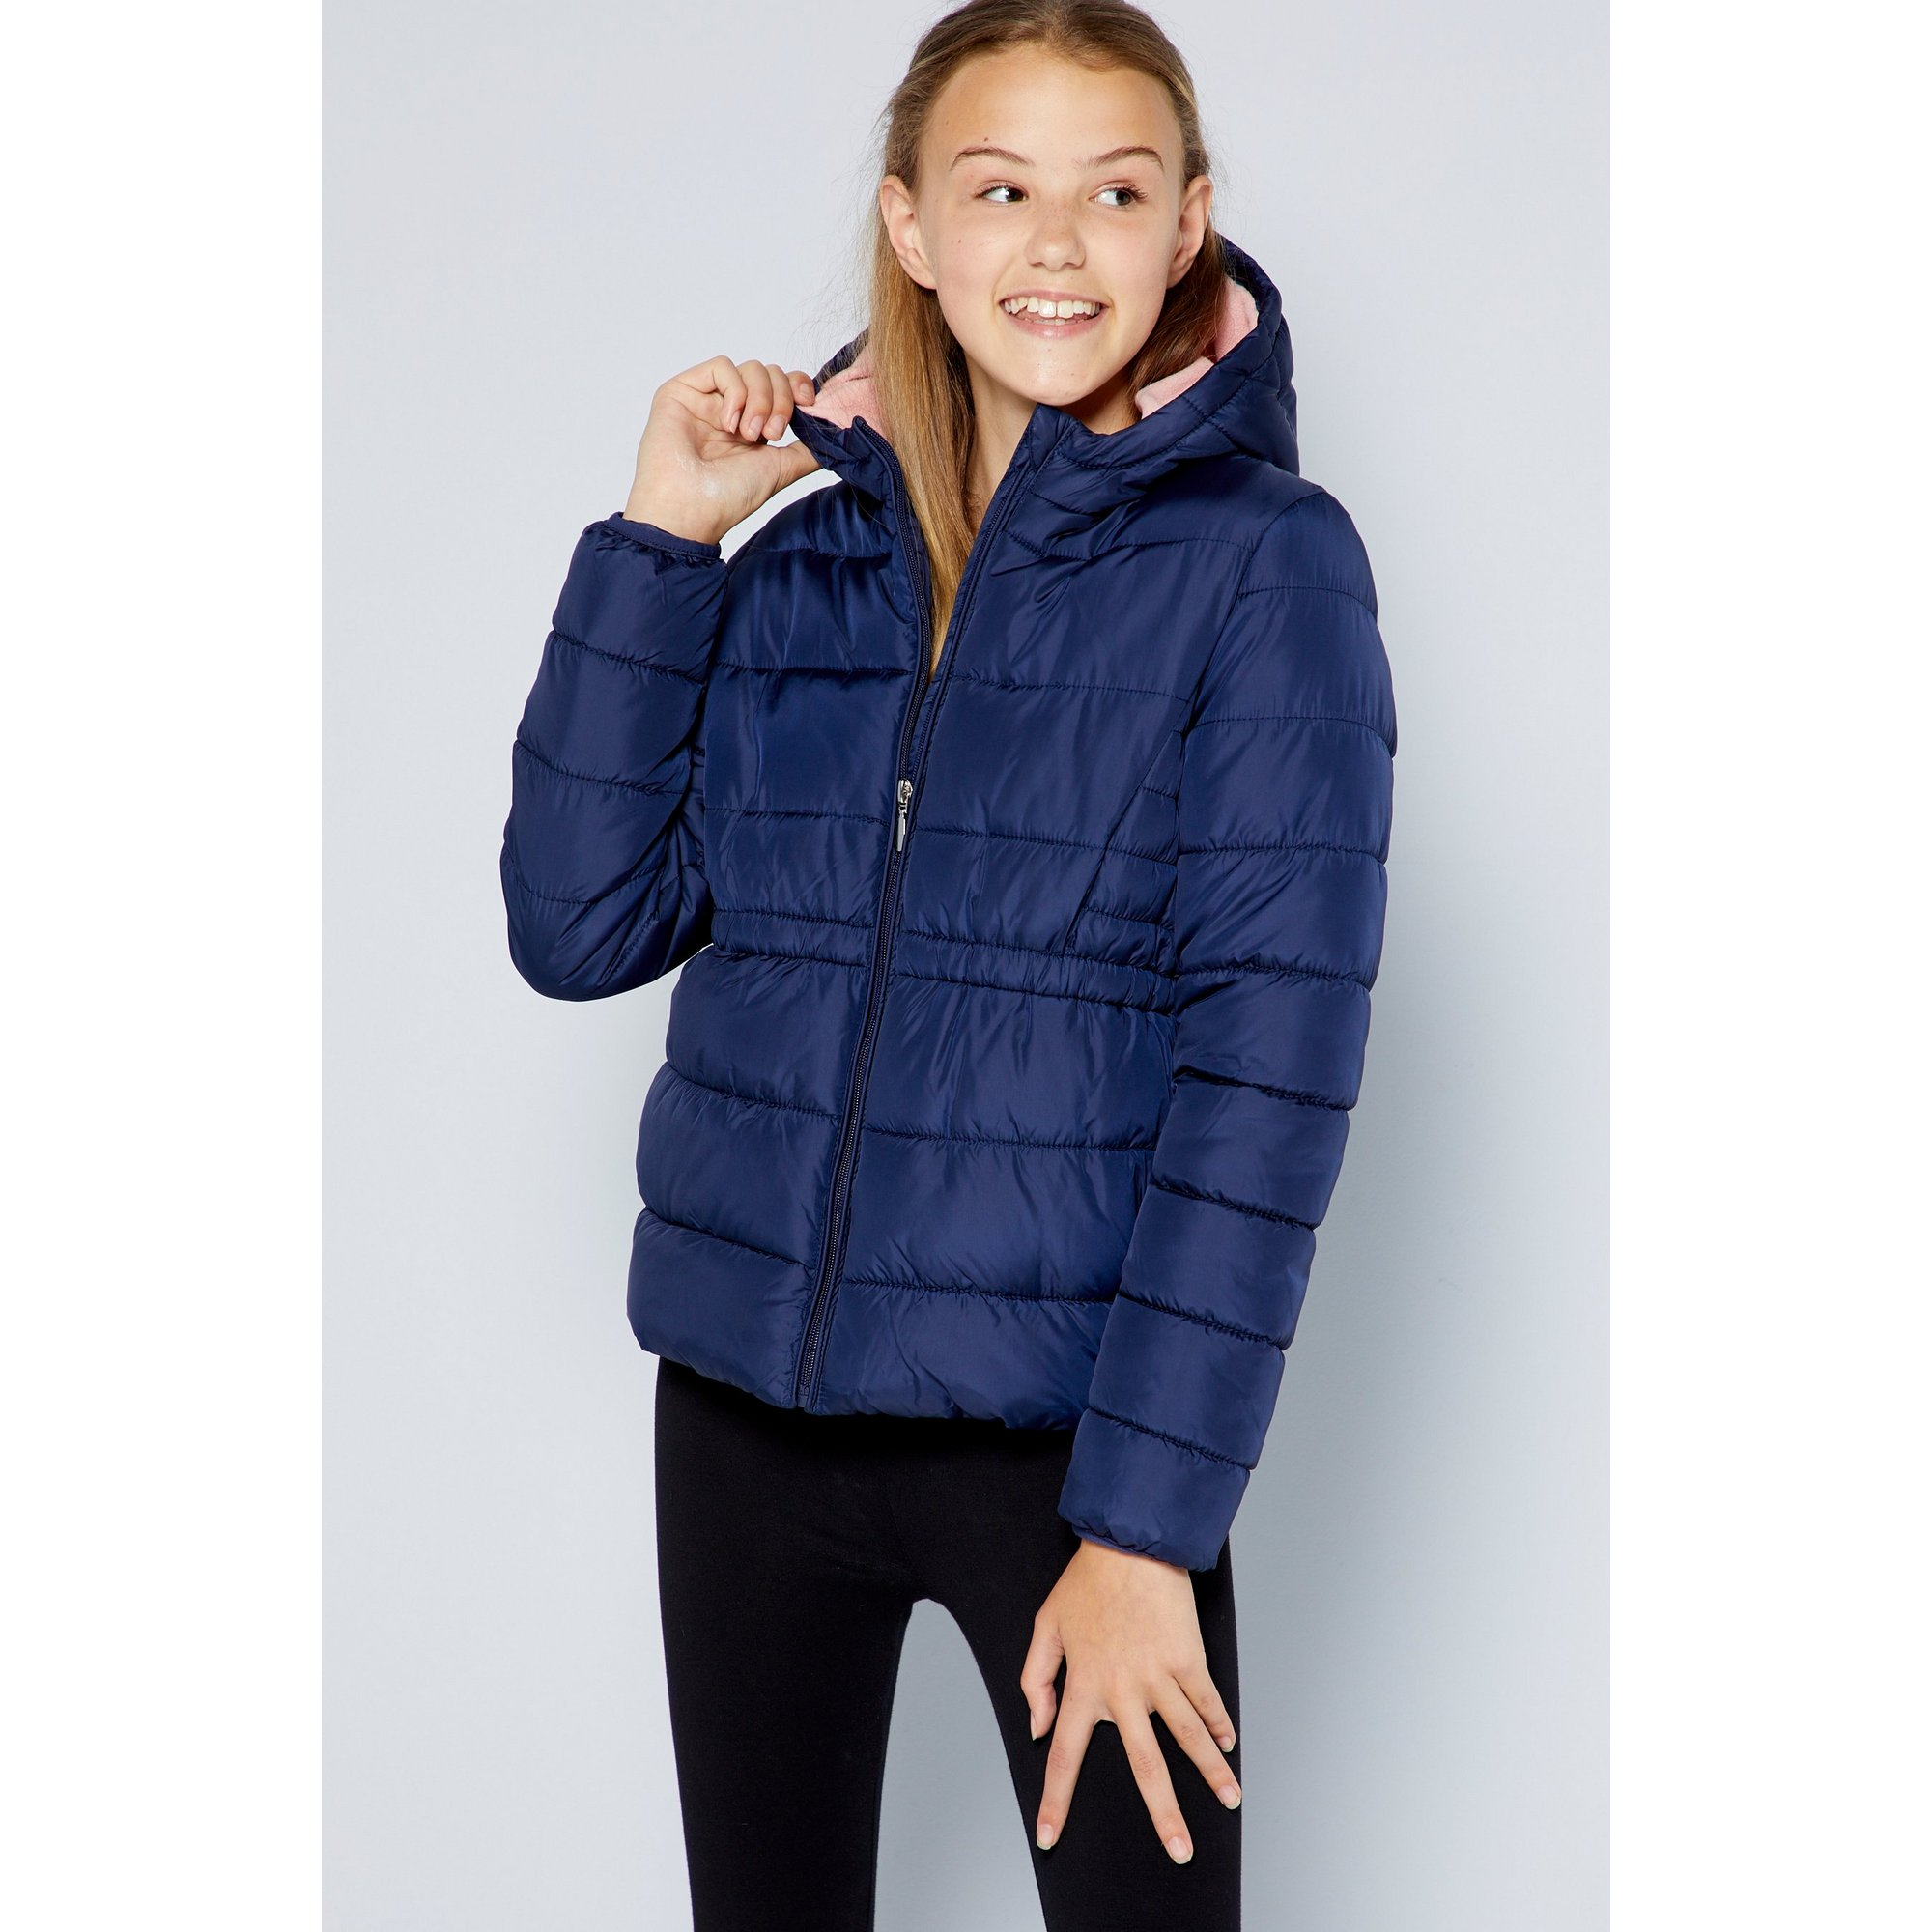 Image of Older Girls School Micro Fleece Lined Padded Jacket